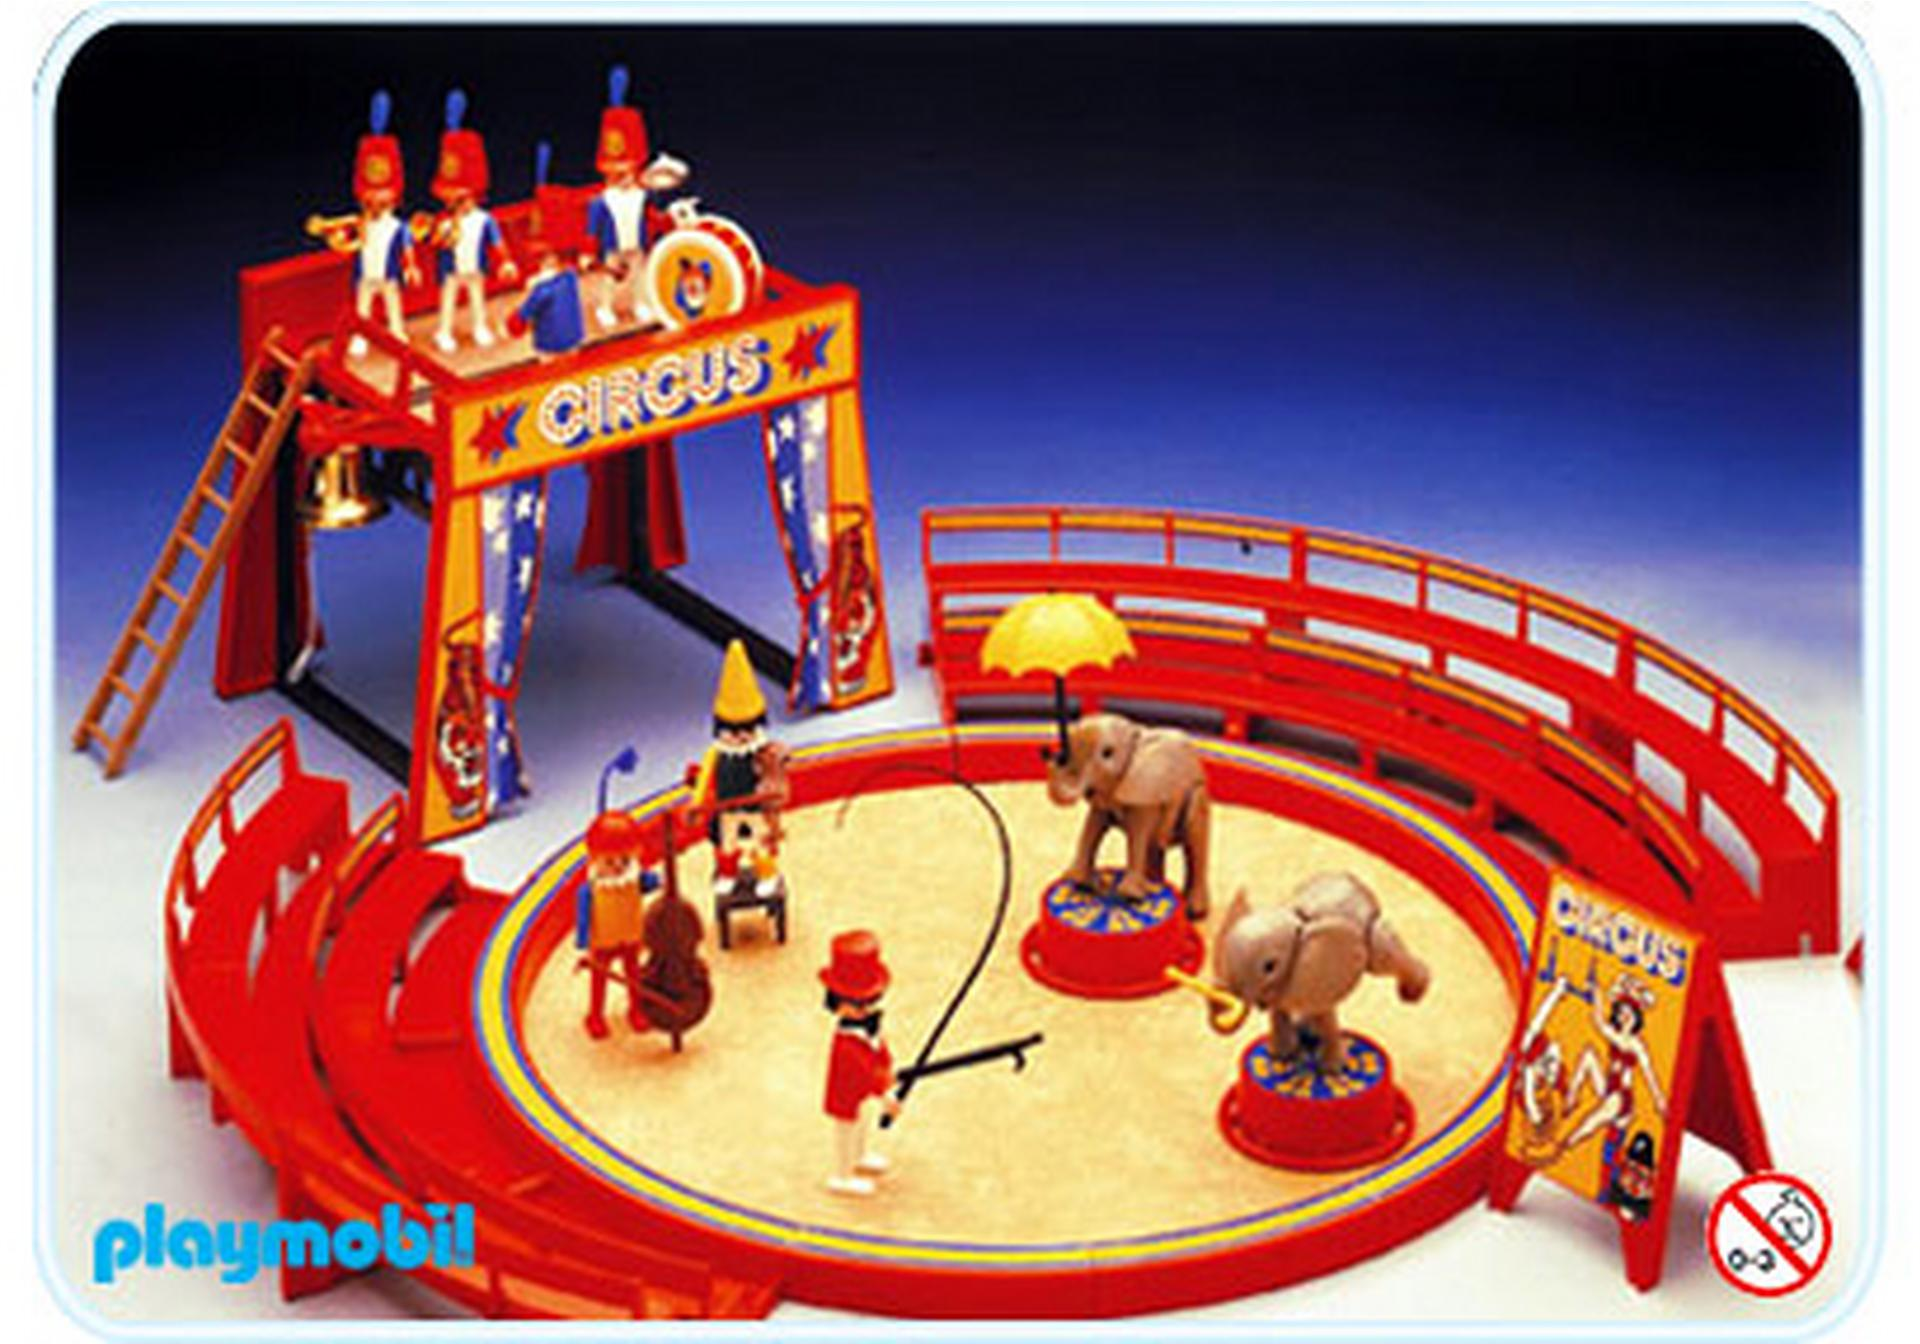 Man ge cirque 3553 a playmobil france - Cirque playmobil ...